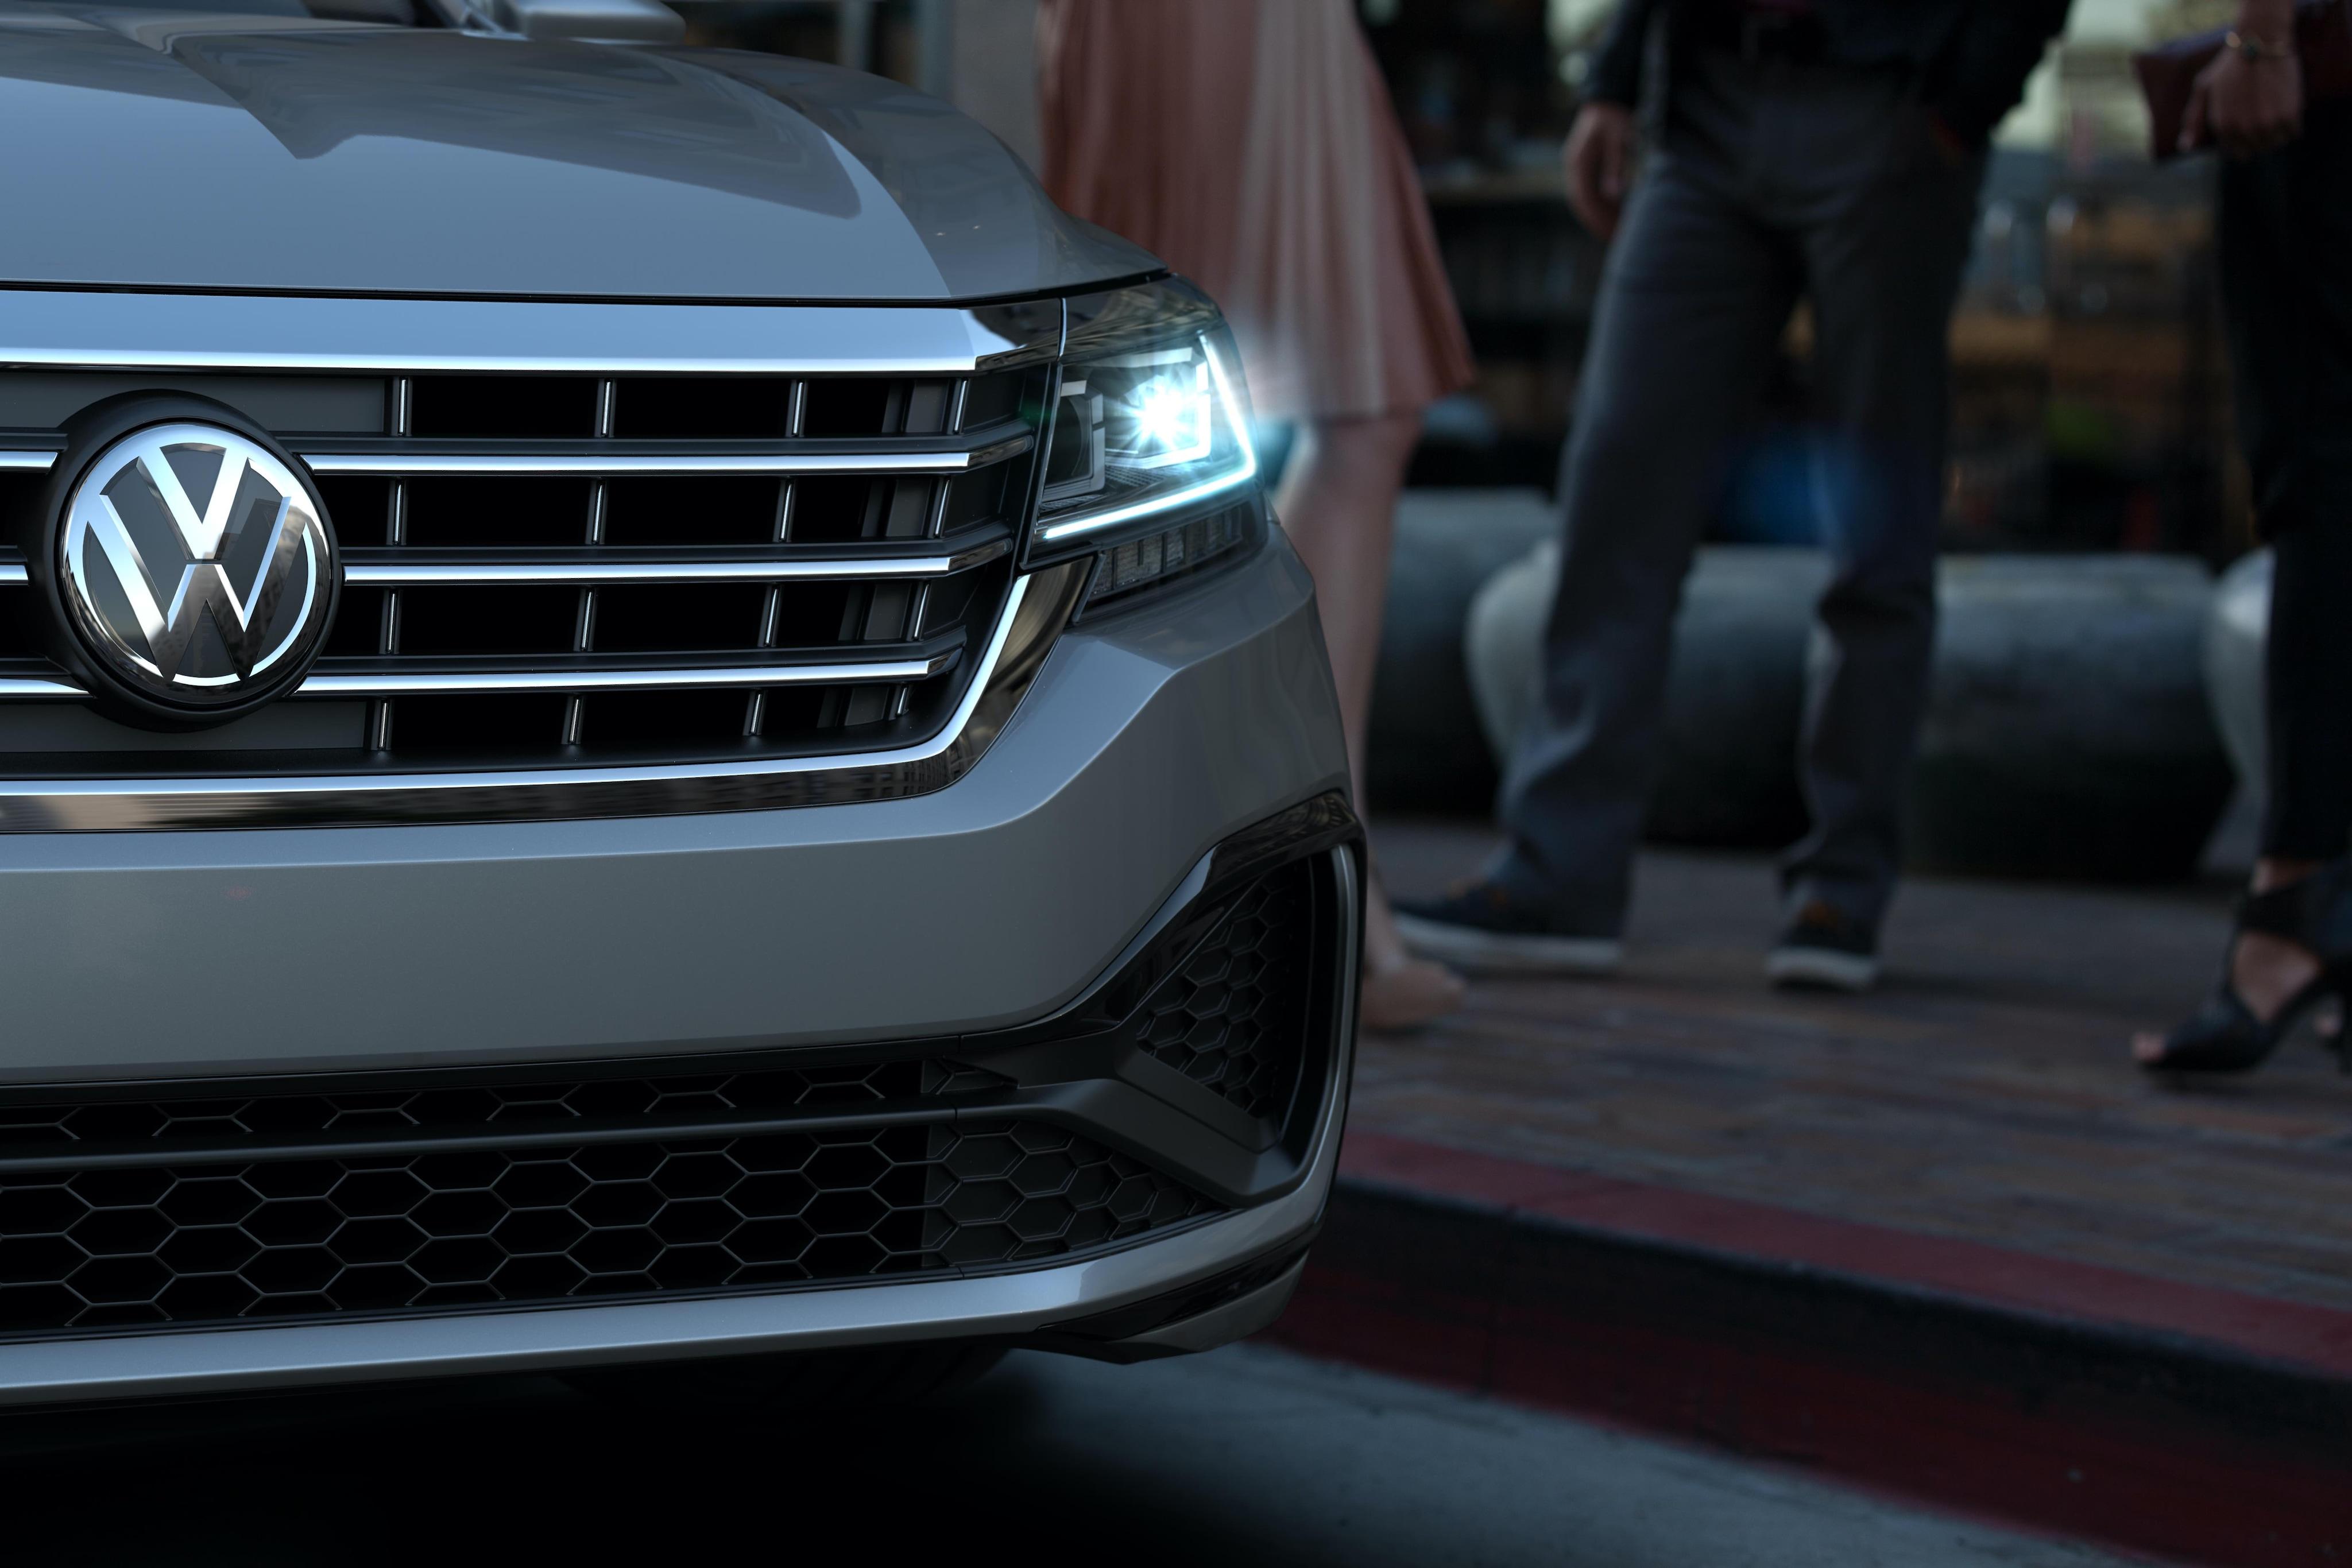 2020 VW Passat R-Line Gray Grille LED Lights